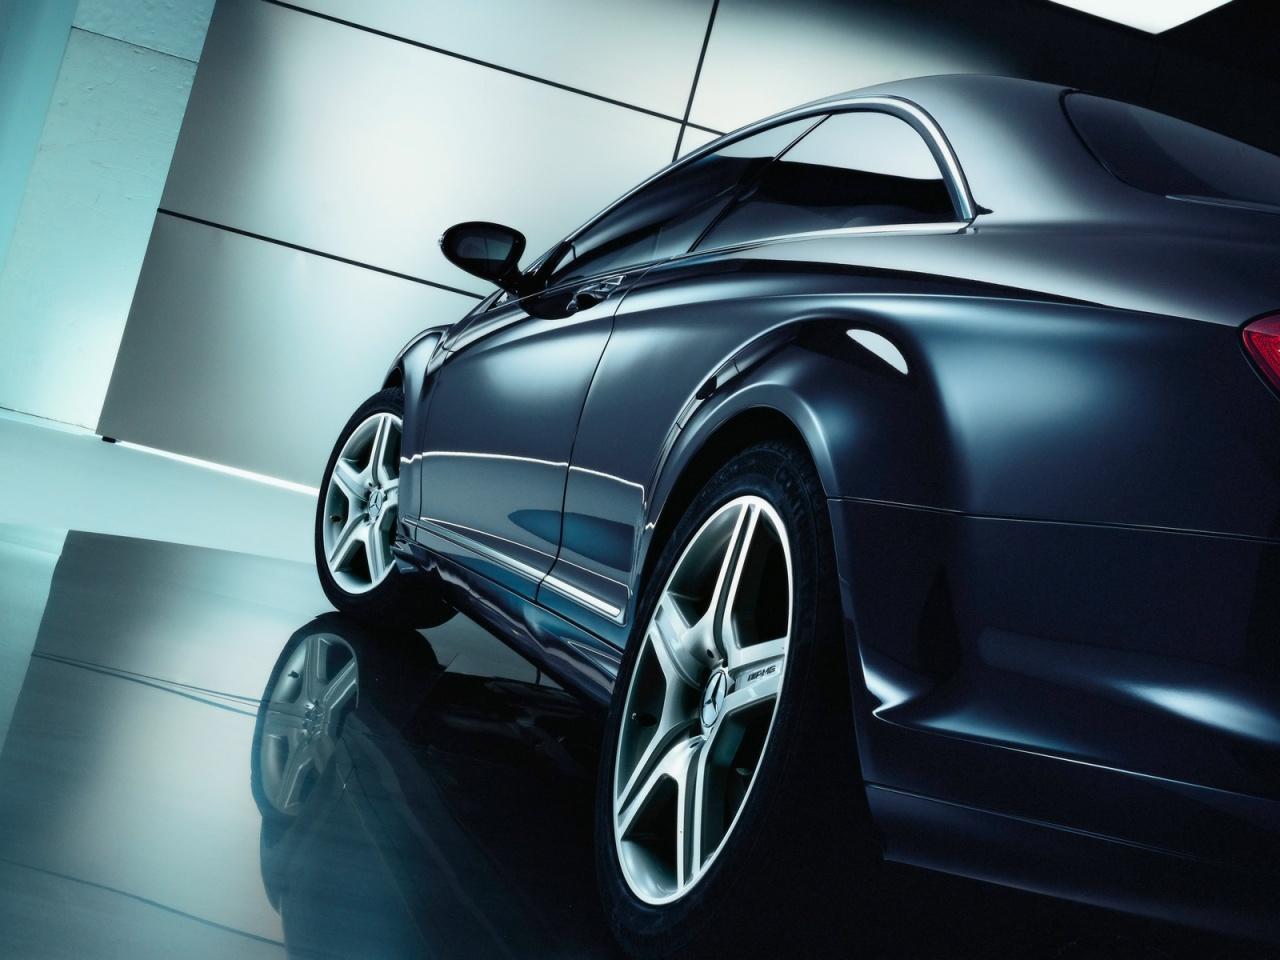 http://3.bp.blogspot.com/_gx12Su4zZ3Q/TP3PO1bQaYI/AAAAAAAAAYM/UTRAi_MnVho/s1600/ws_Mercedes_Benz_1280x1024.jpg